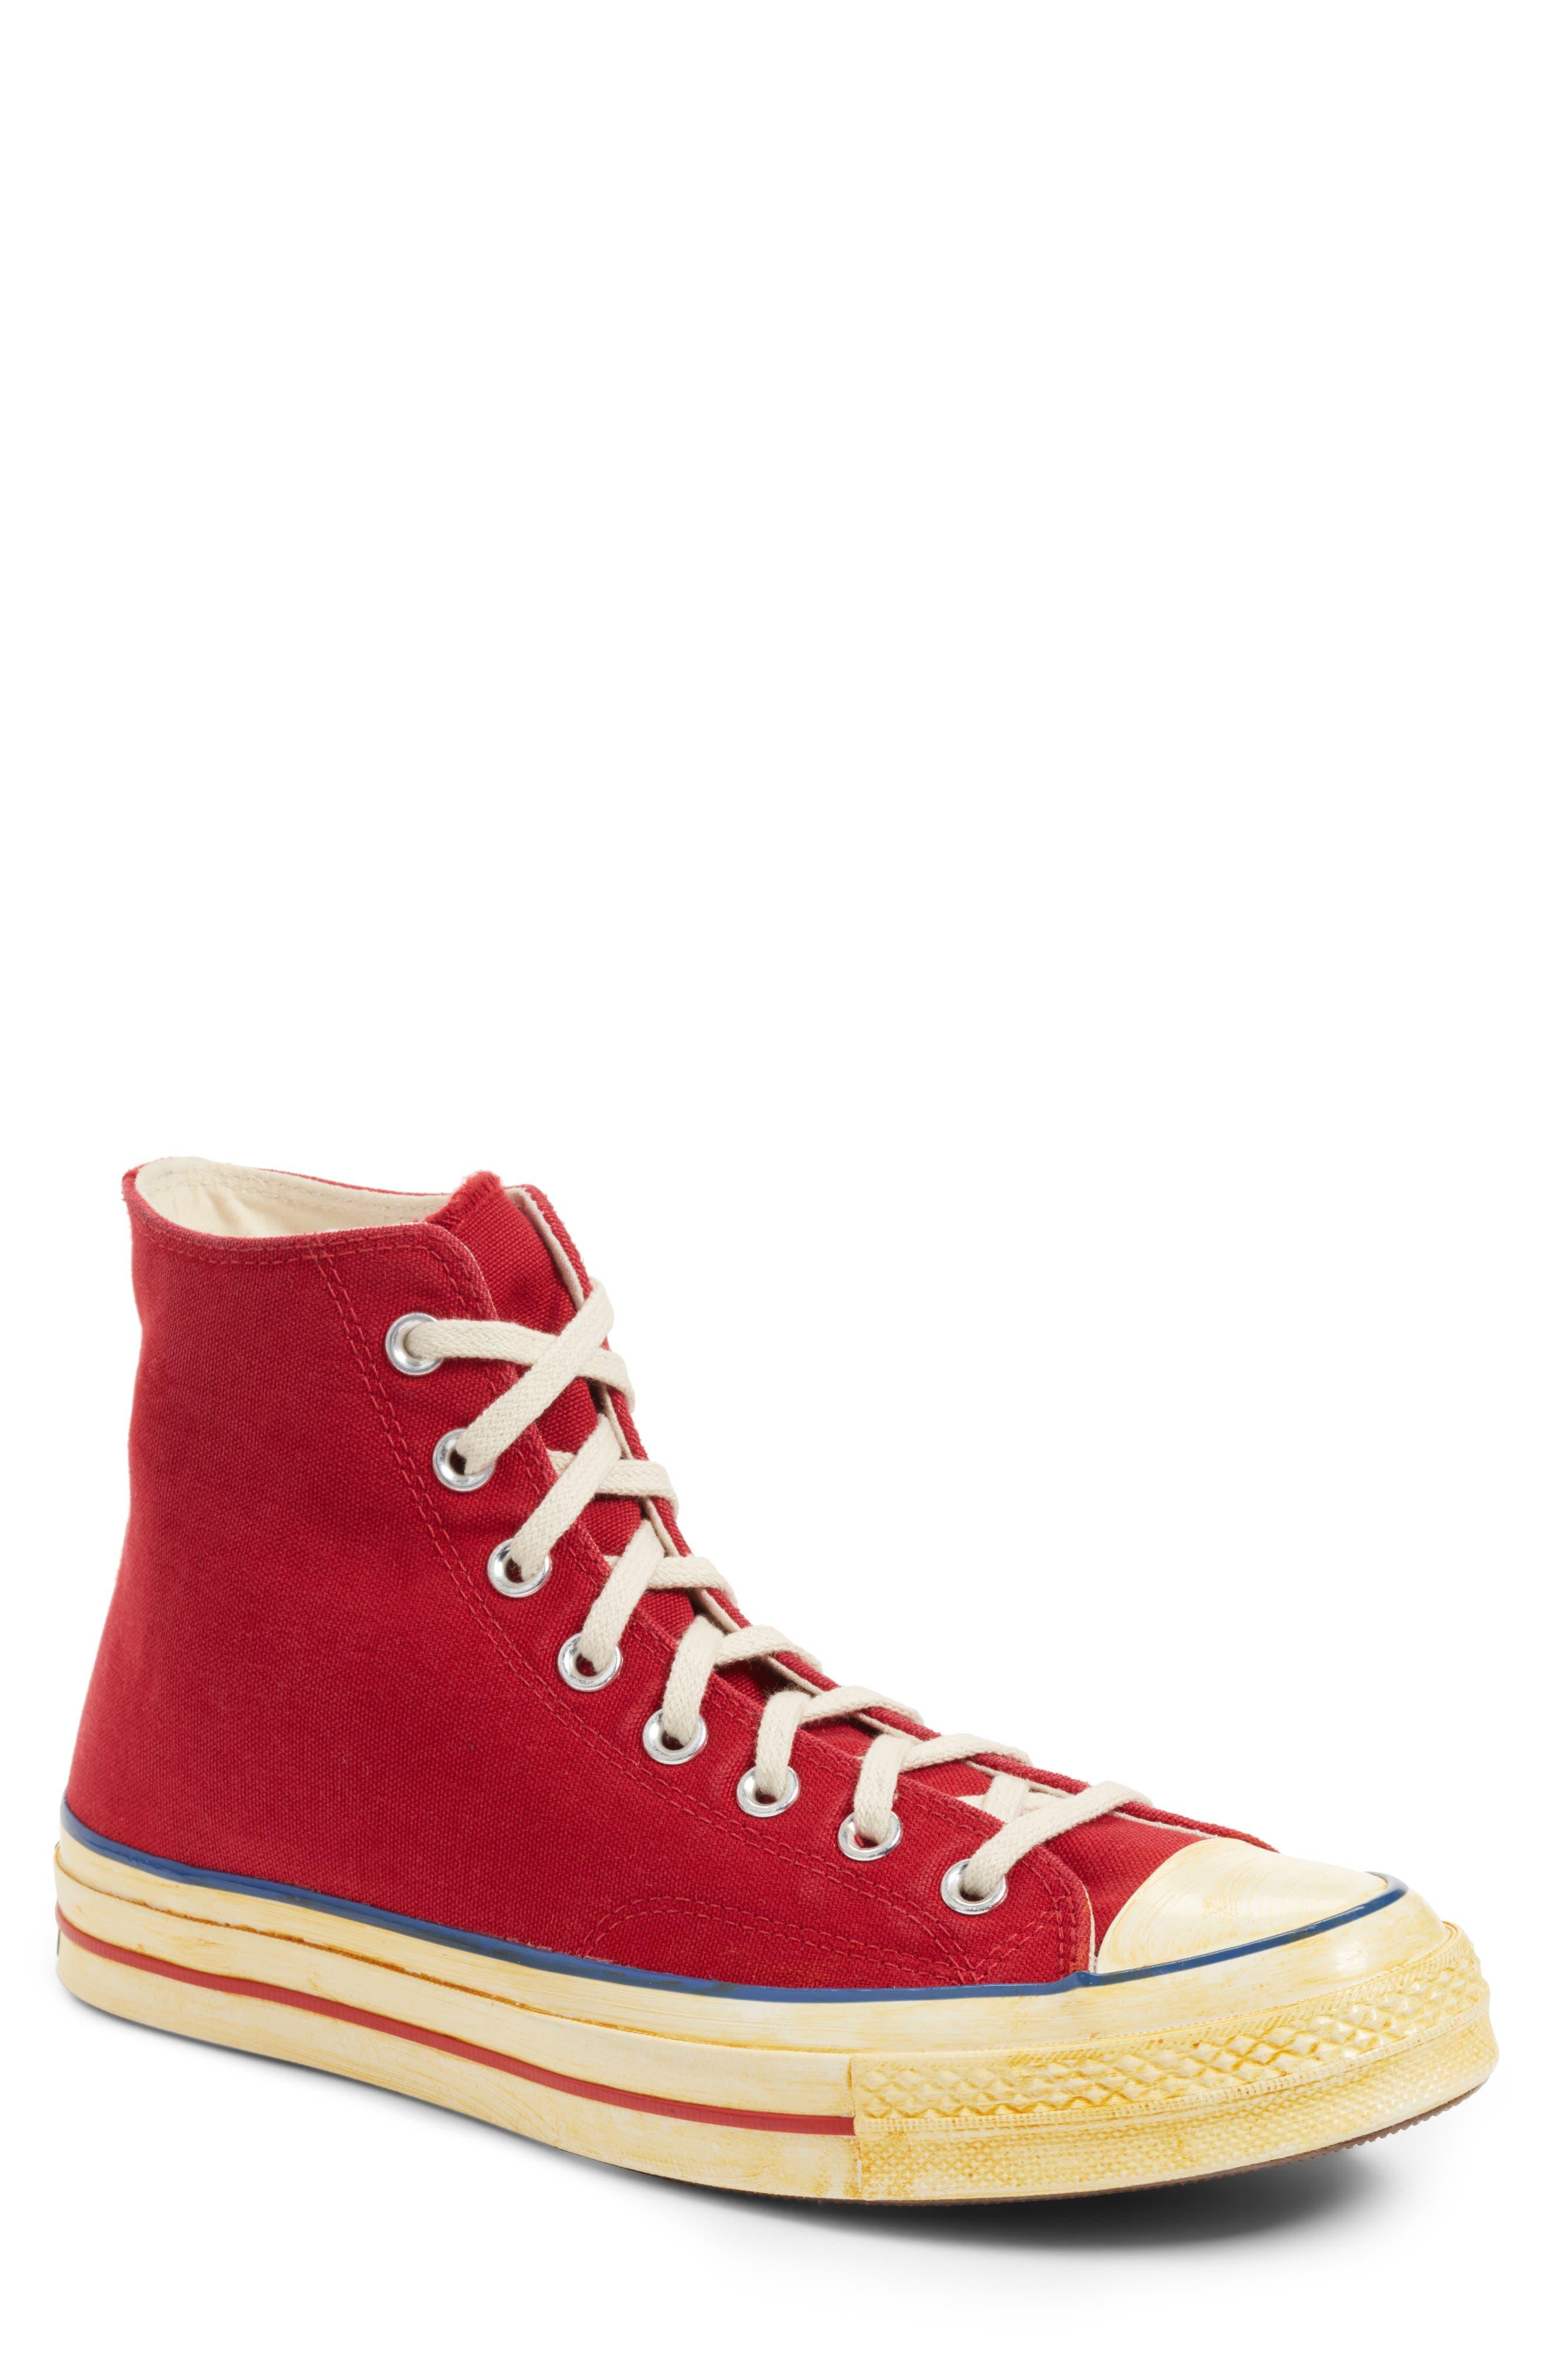 Main Image - Converse Chuck Taylor® All Star® 70 High Top Sneaker (Men)